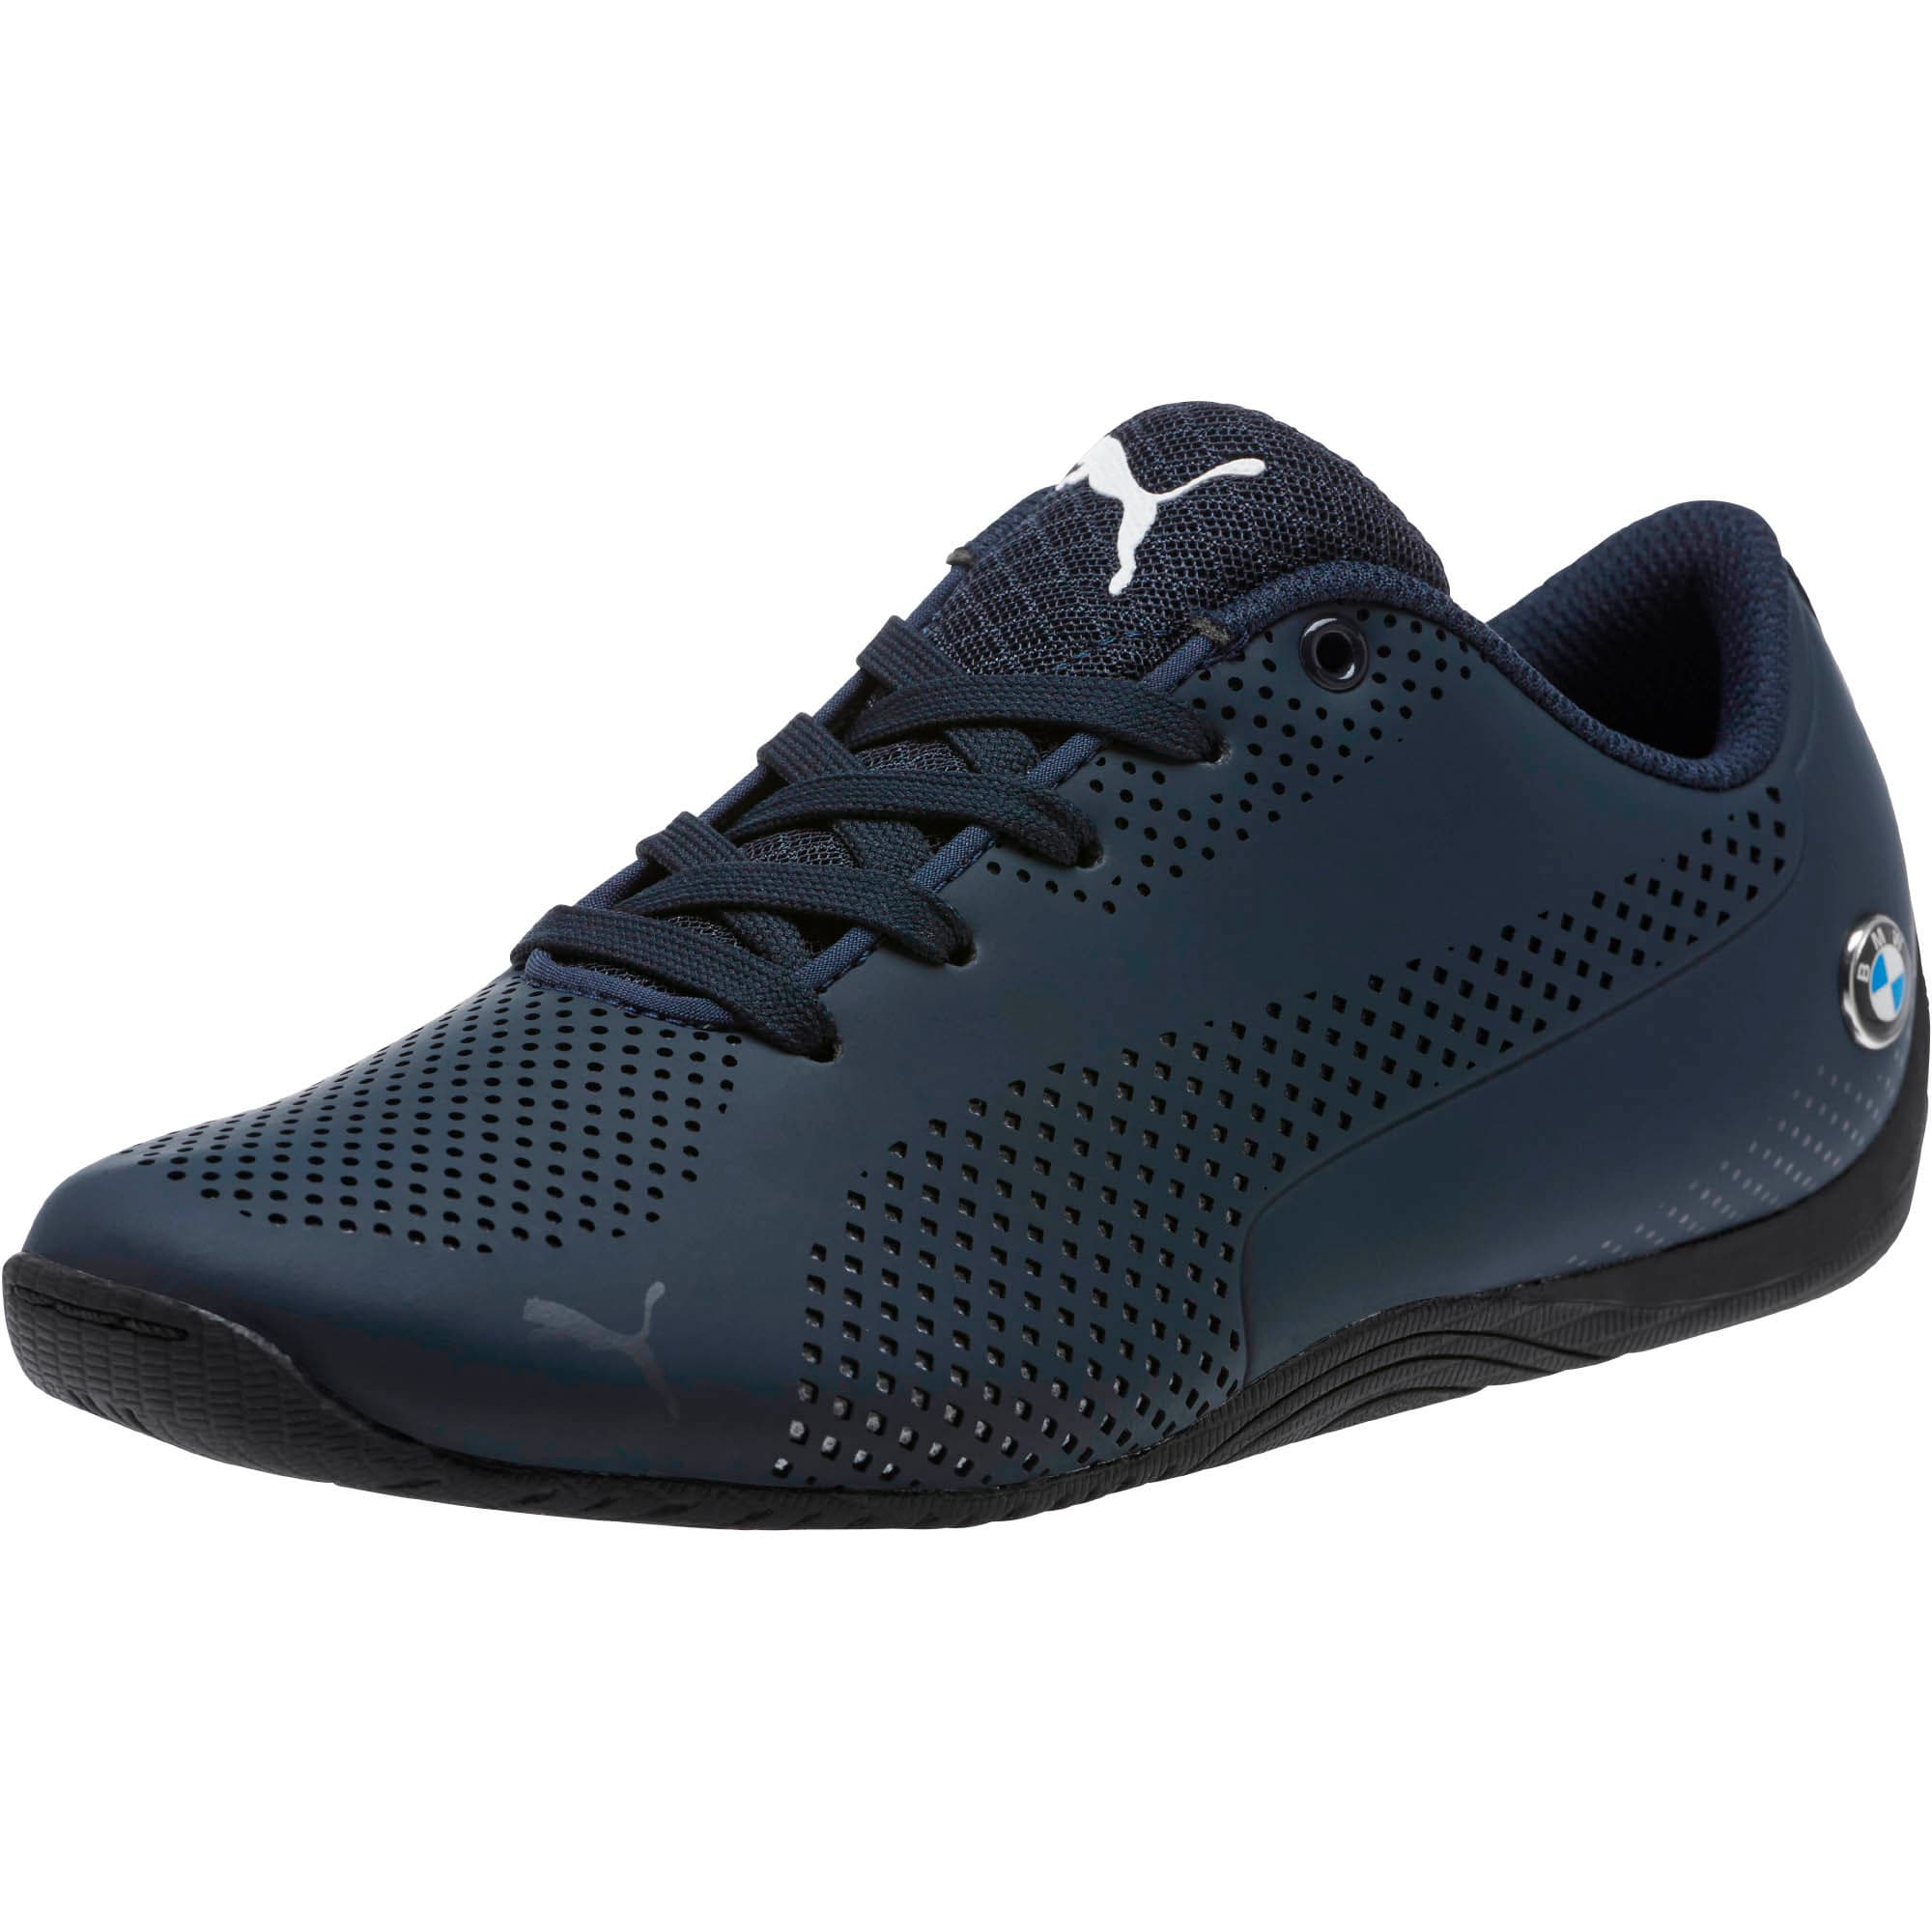 BMW MS Drift Cat 5 Ultra JR Shoes